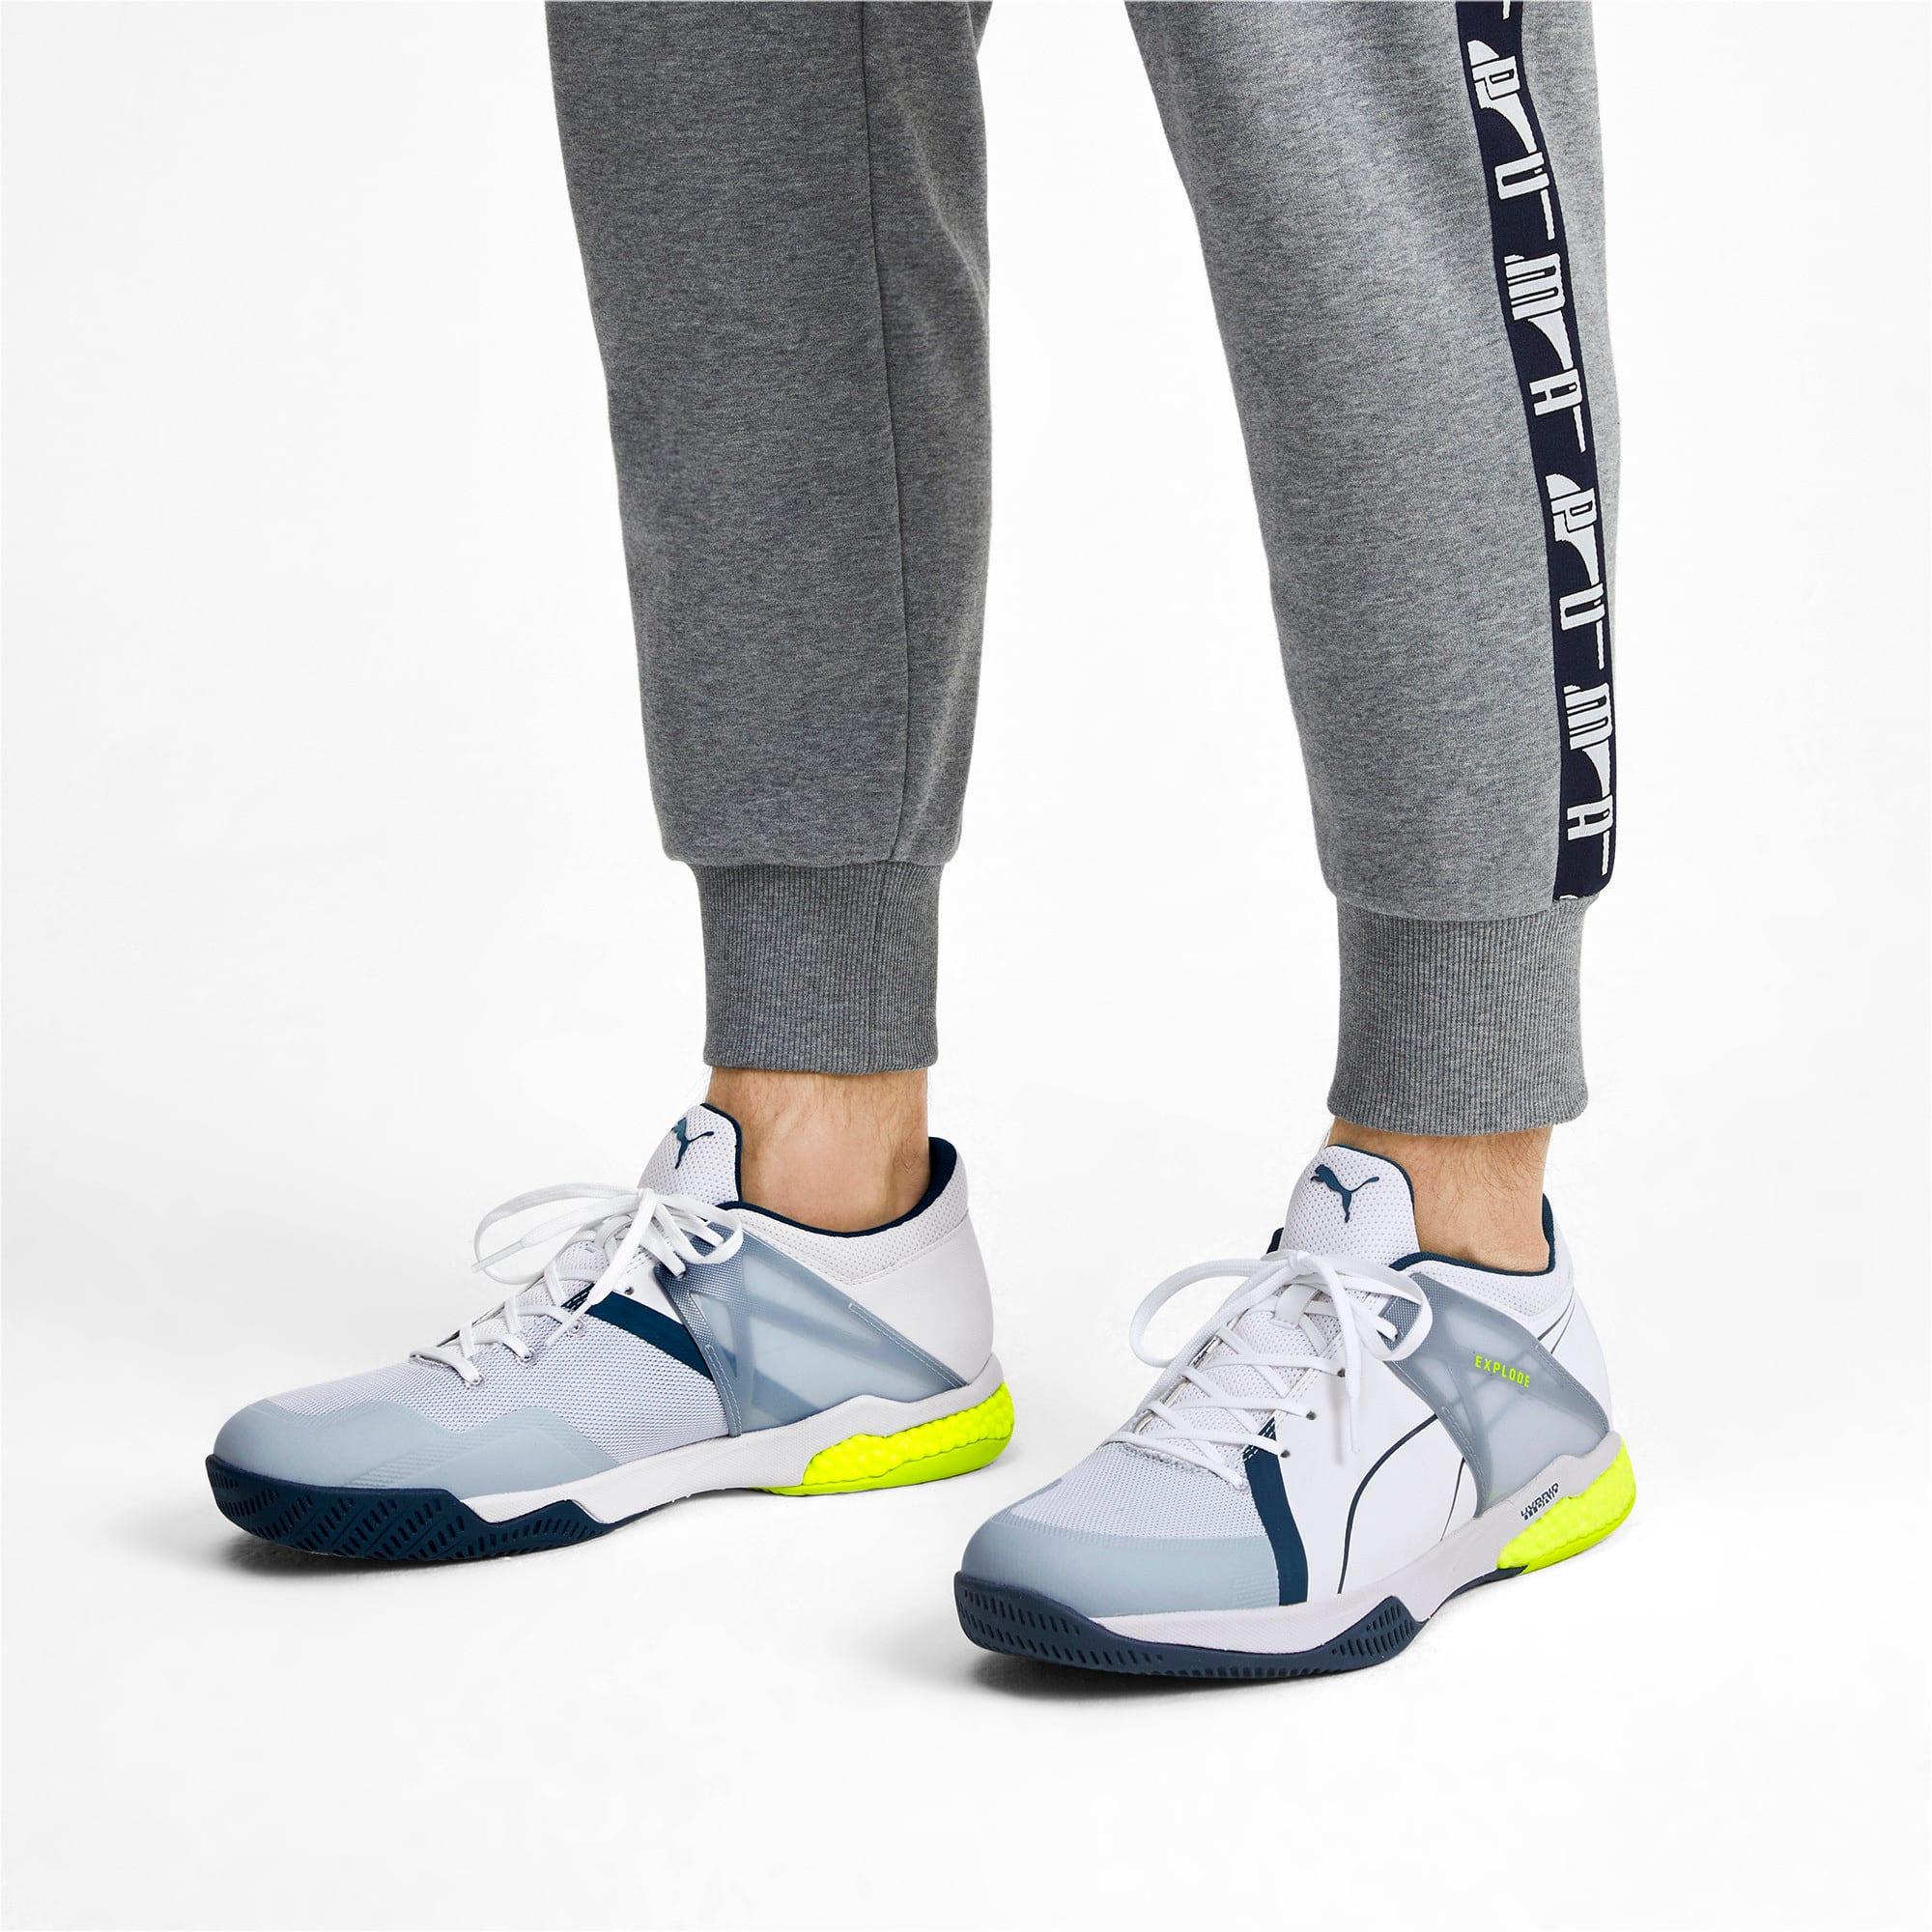 Thumbnail 3 of Explode XT Hybrid 2 Handball Shoes, White-Grey-Yellow-Gibraltar, medium-IND